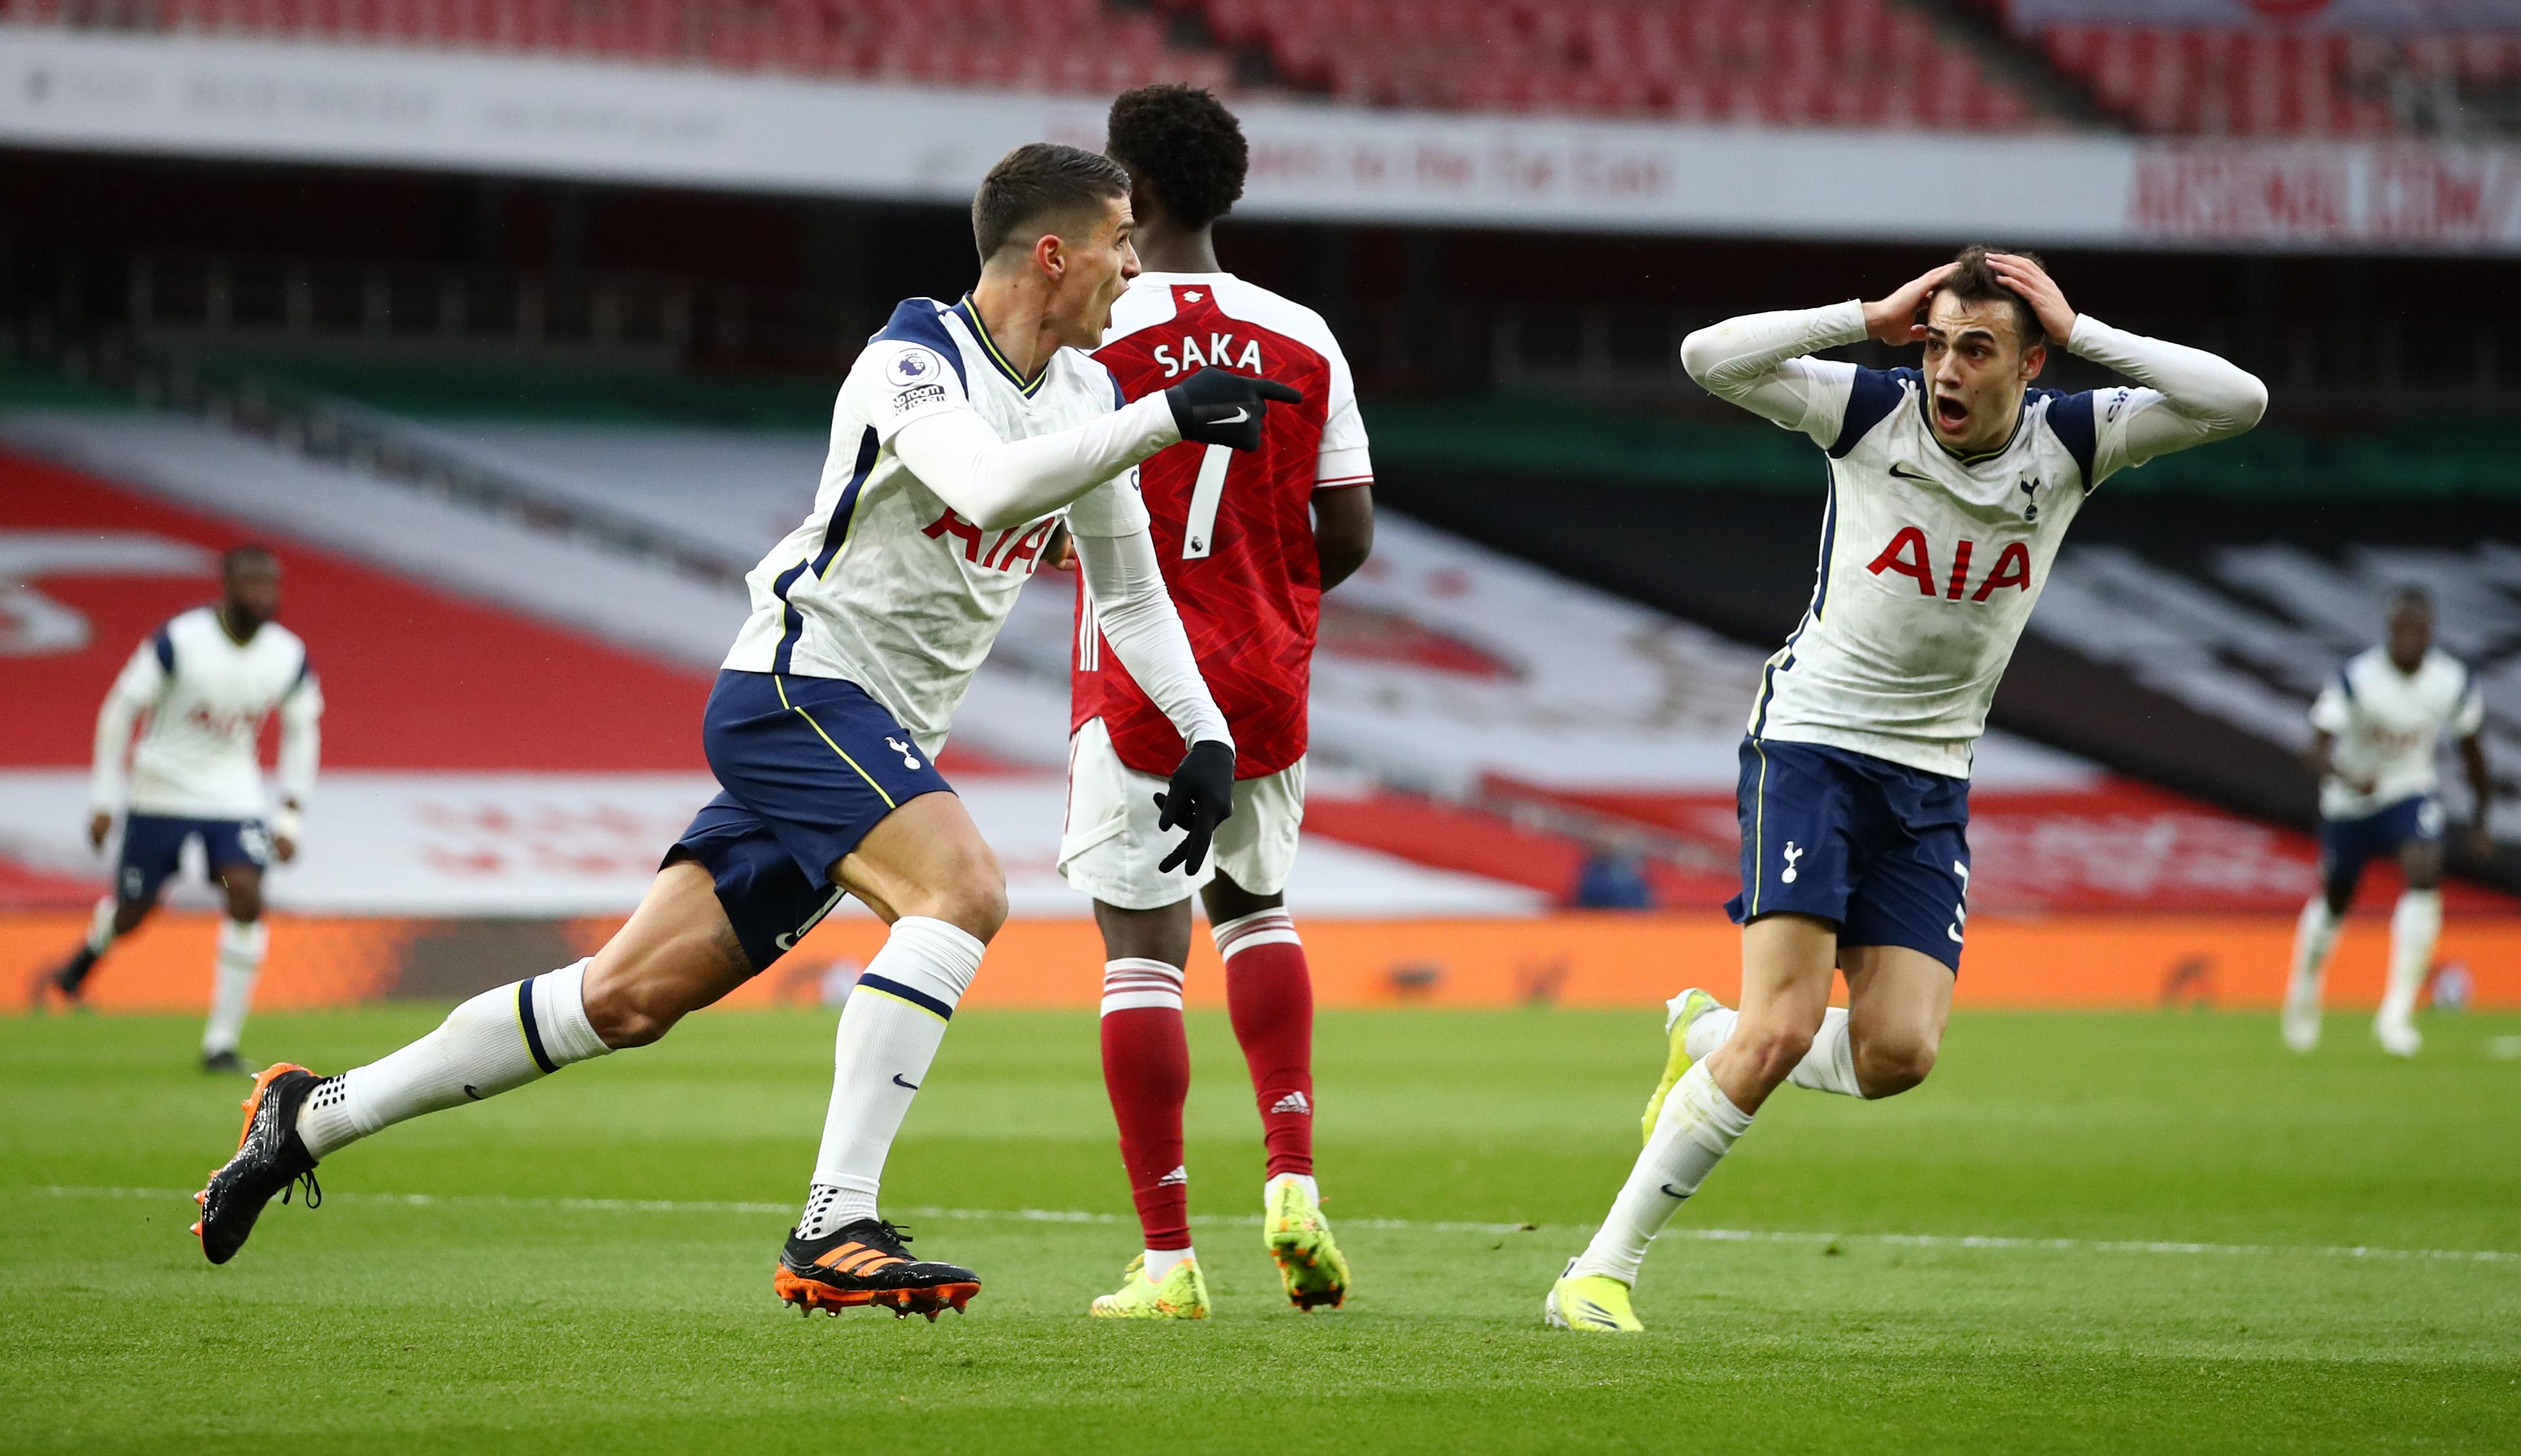 Sergio Reguilon reacts as Erik Lamela wheels away to celebrate his rabona kick goal against Arsenal. (Tottenham Hotspur website/Twitter)